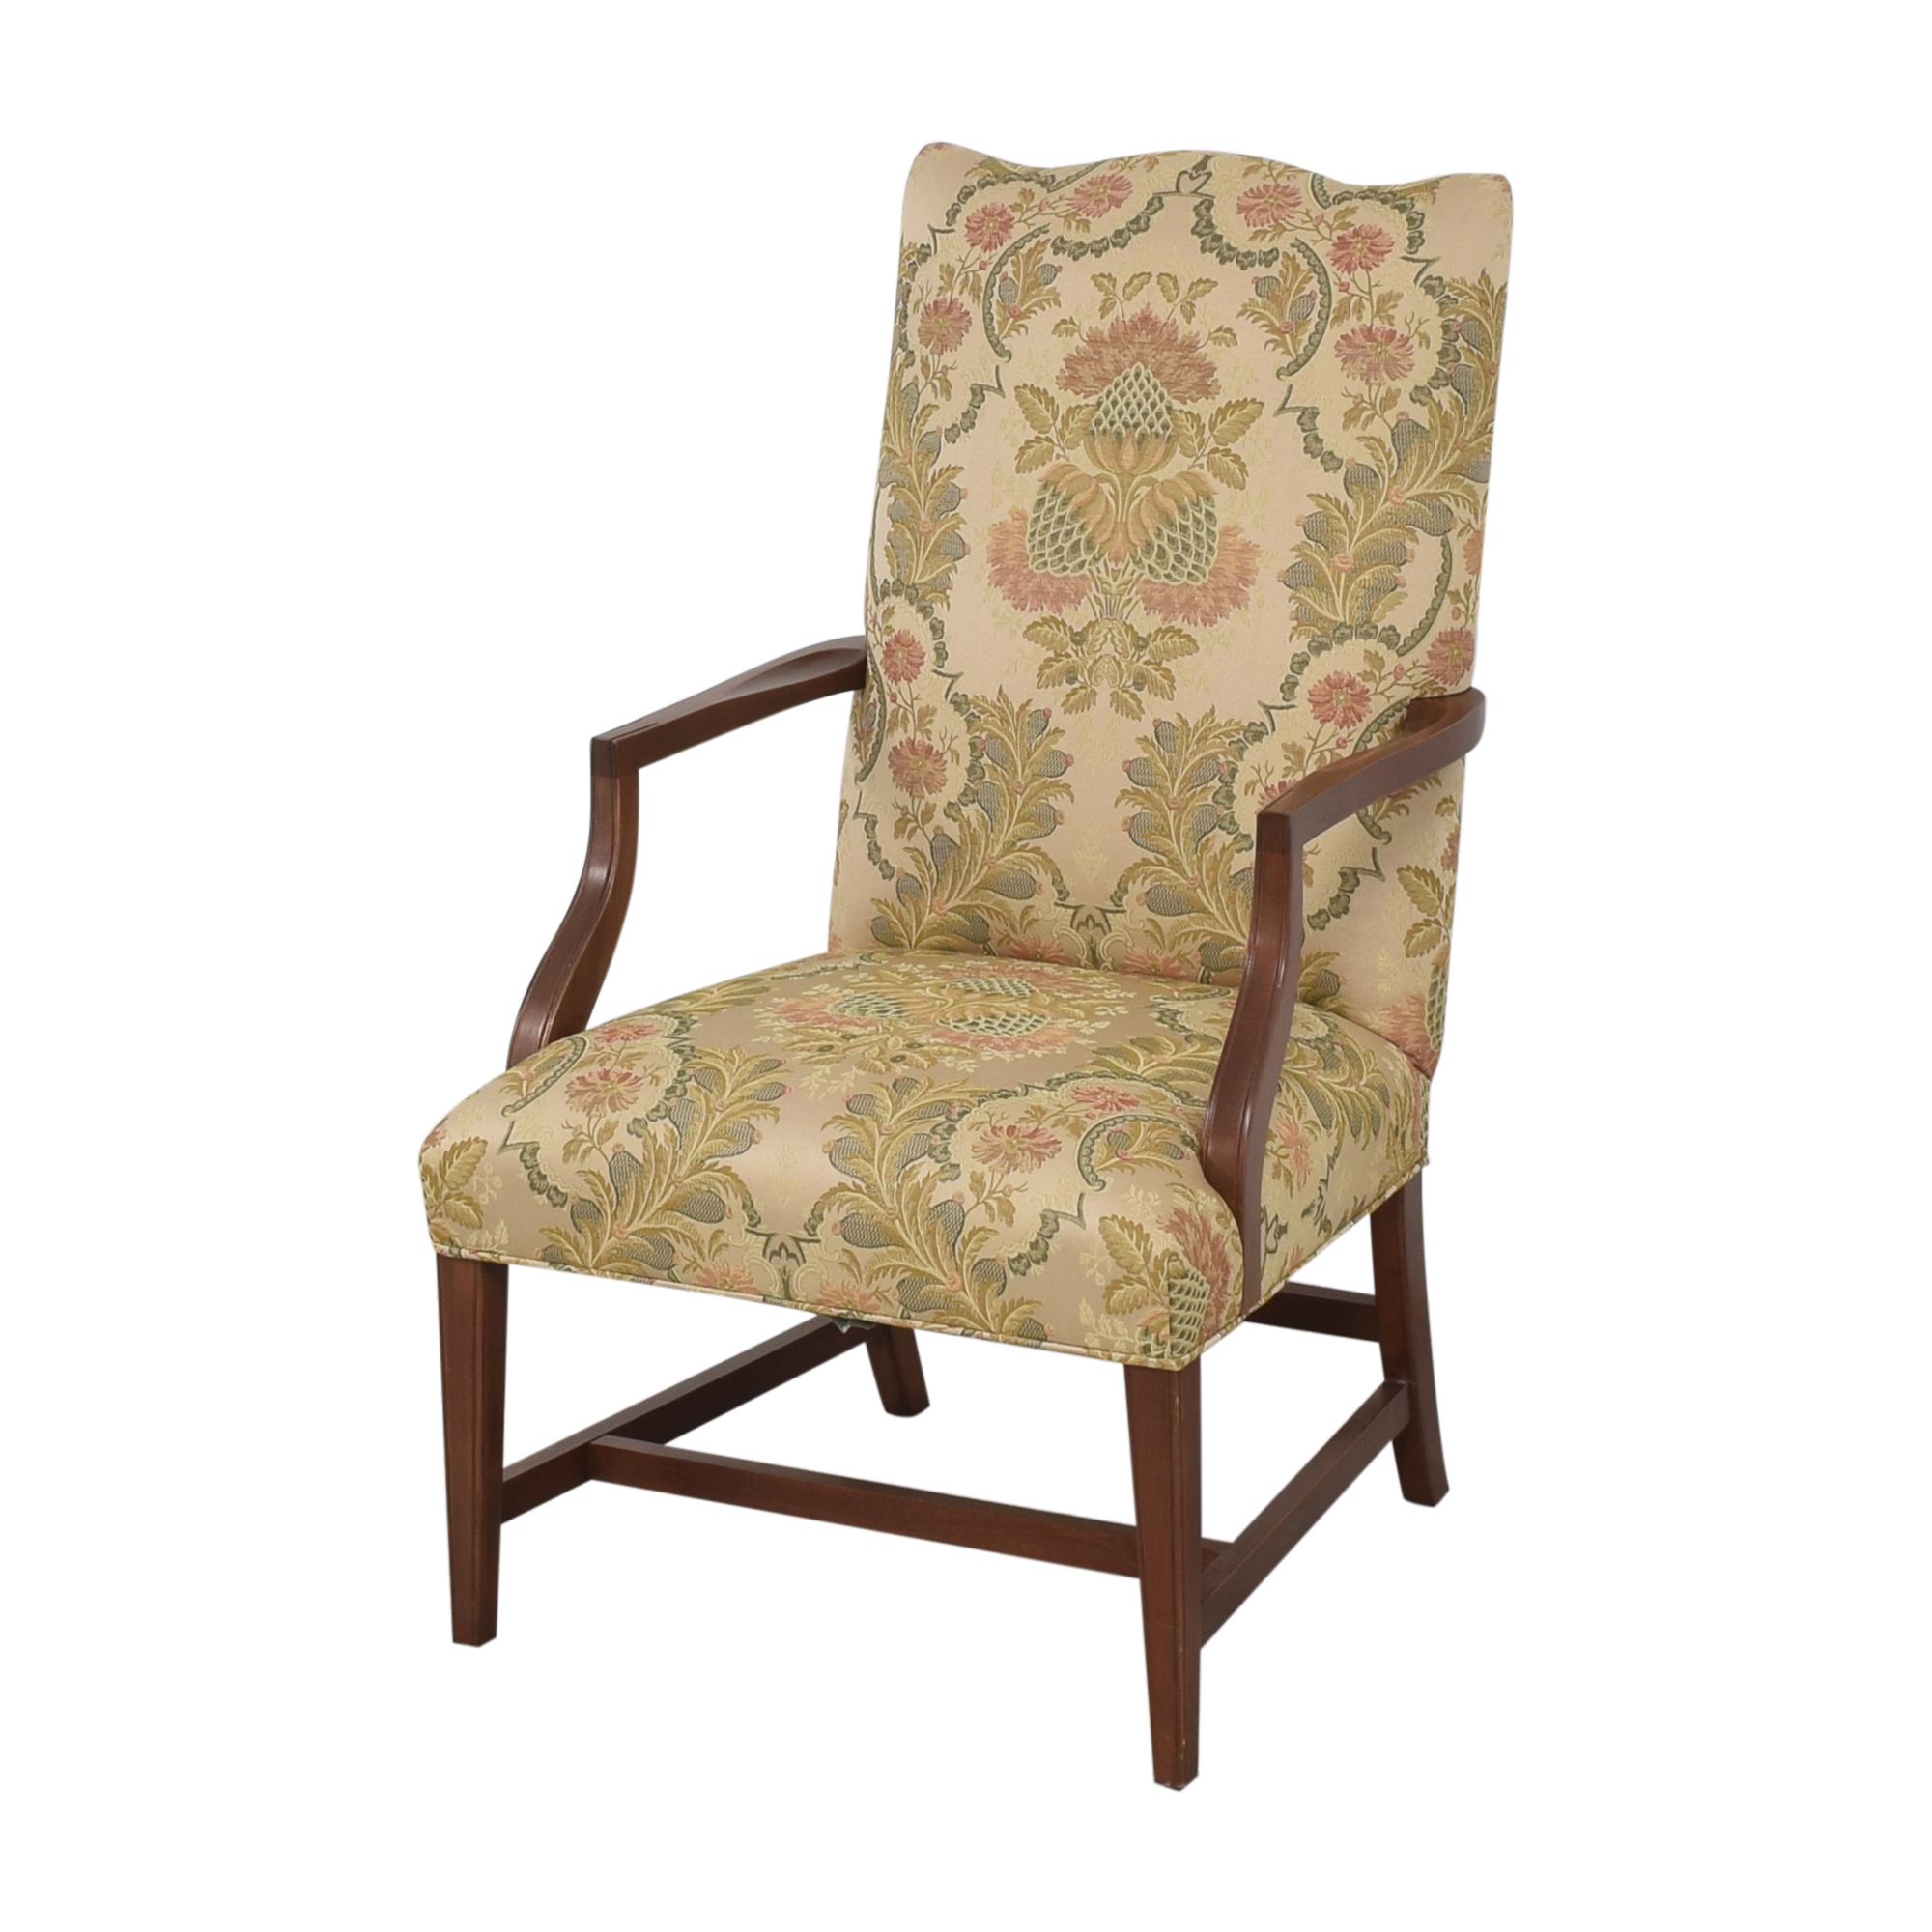 Ethan Allen Ethan Allen Martha Washington Arm Chair nyc